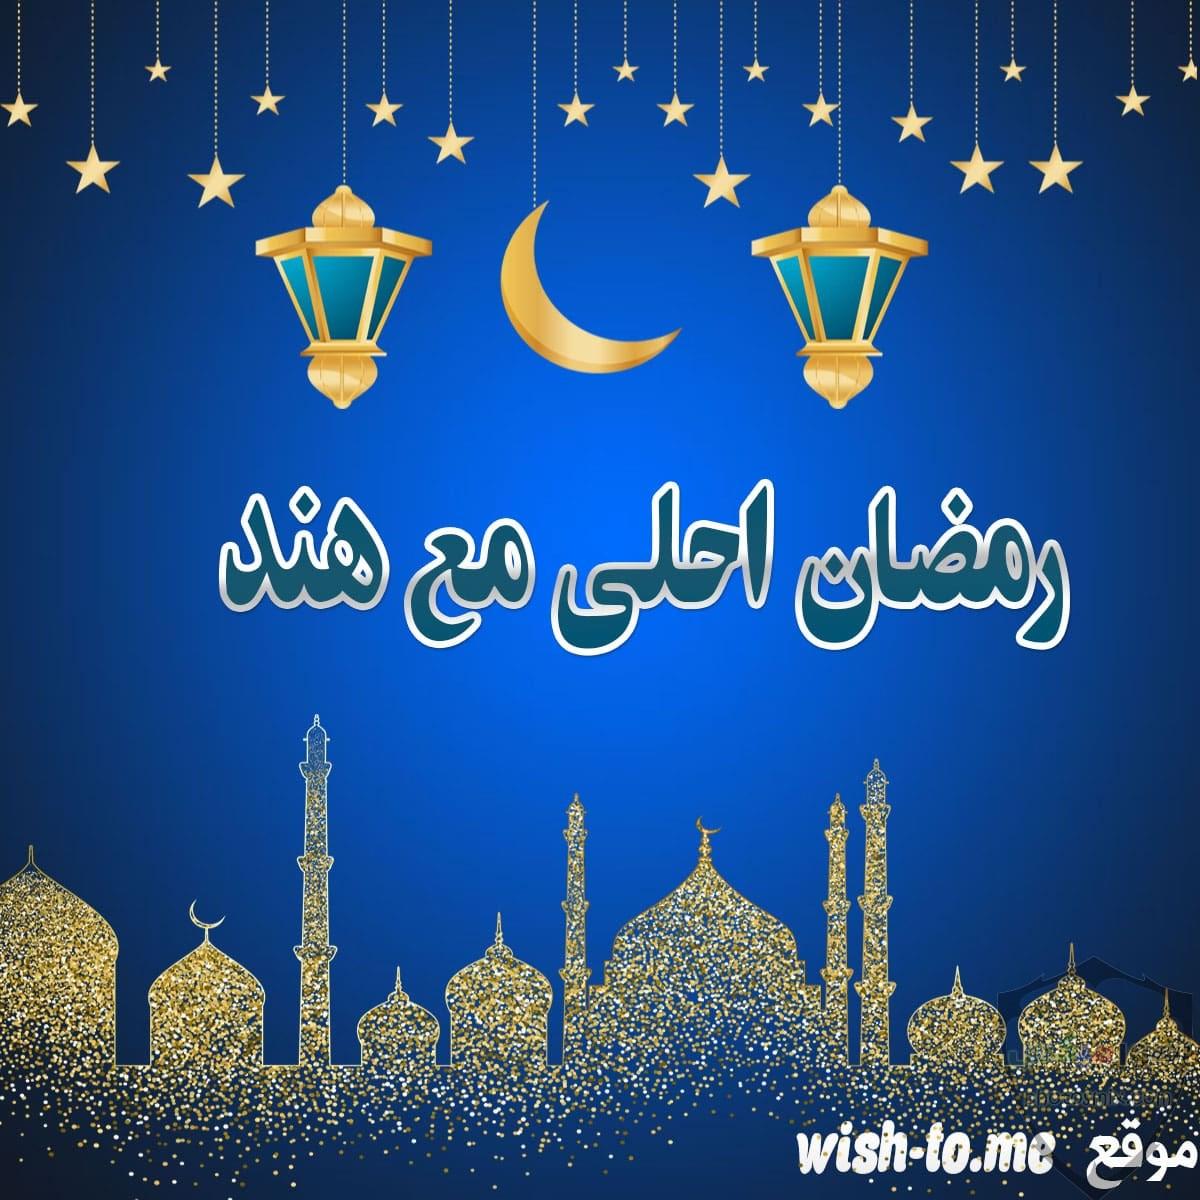 صور تهنئة بمناسبة رمضان 2020 15